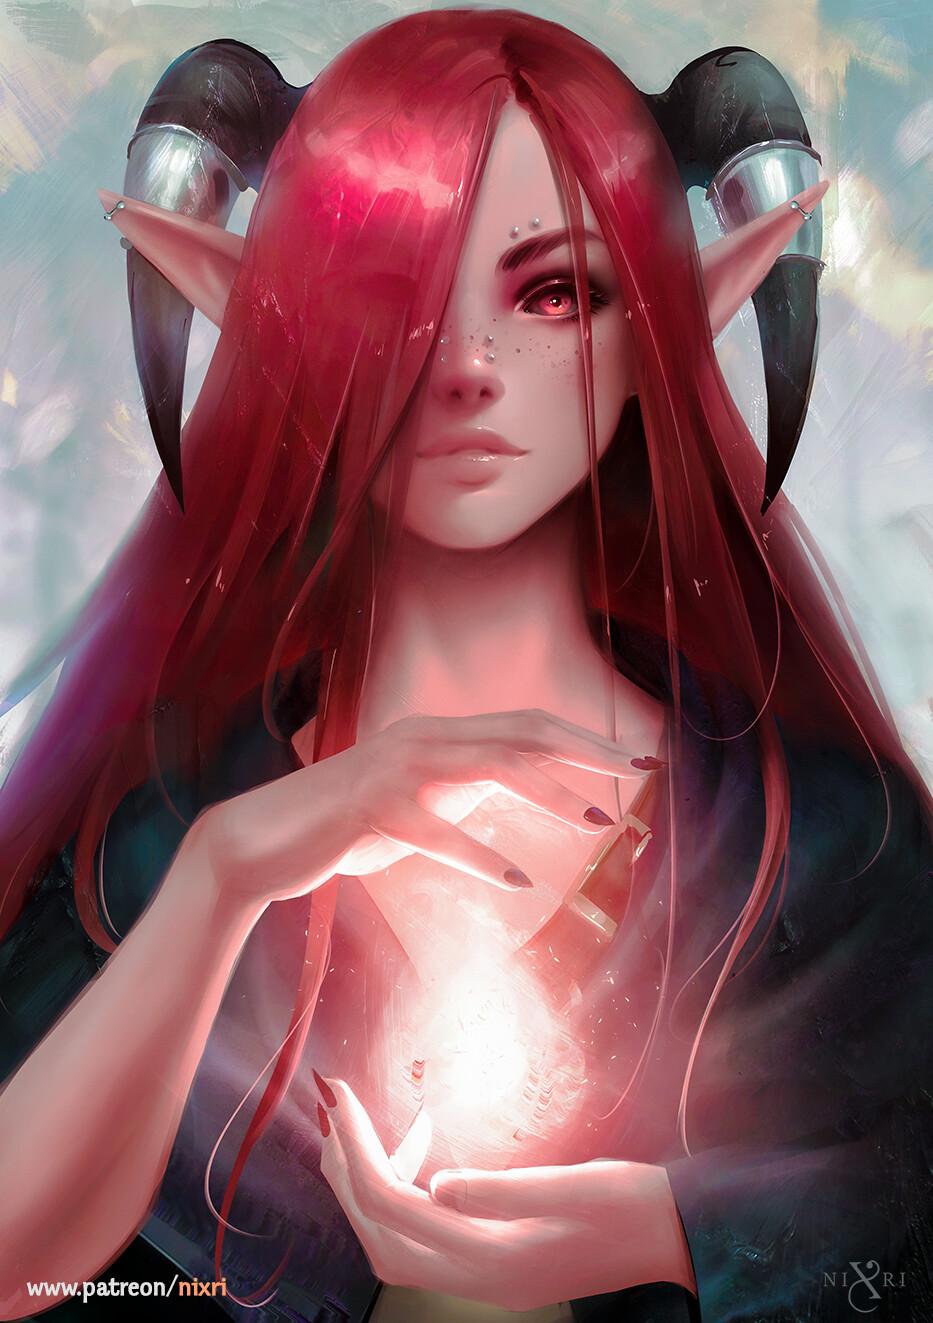 General 933x1323 Nixri women demon girls elf ears demon eyes redhead red eyes piercing freckles magic artwork fan art digital art